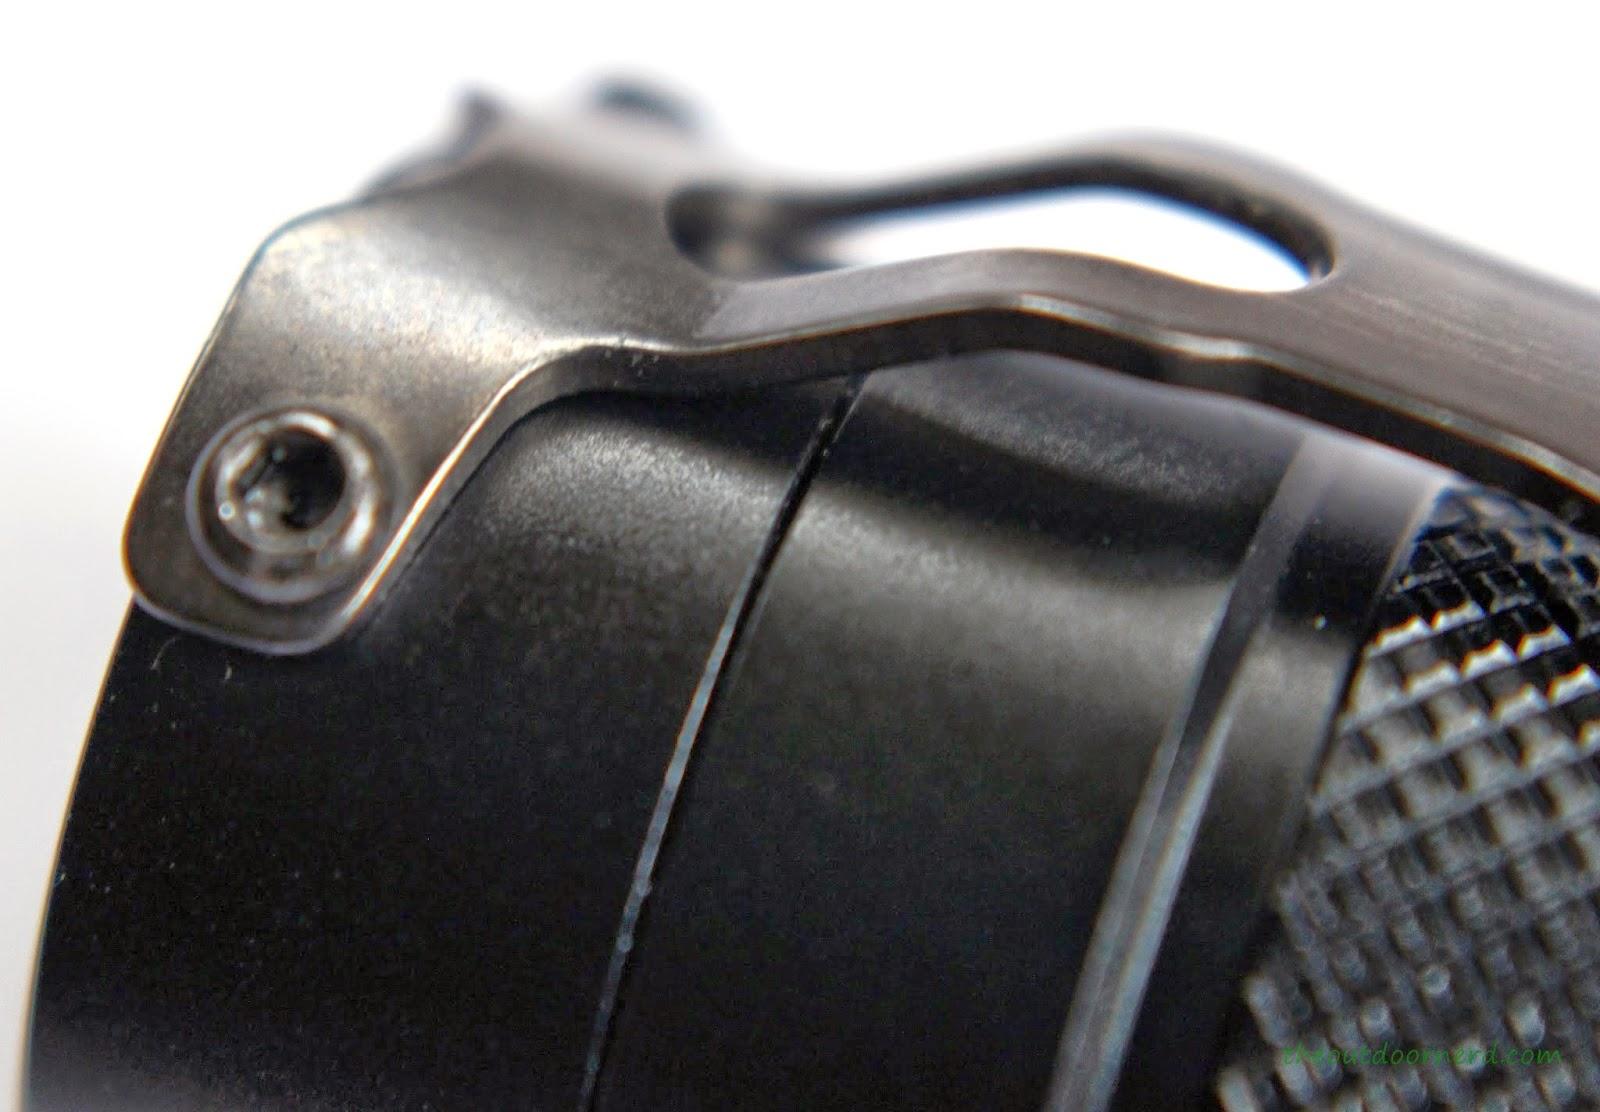 EagleTac D25LC2 Mini 18650 Flashlight Clip 2